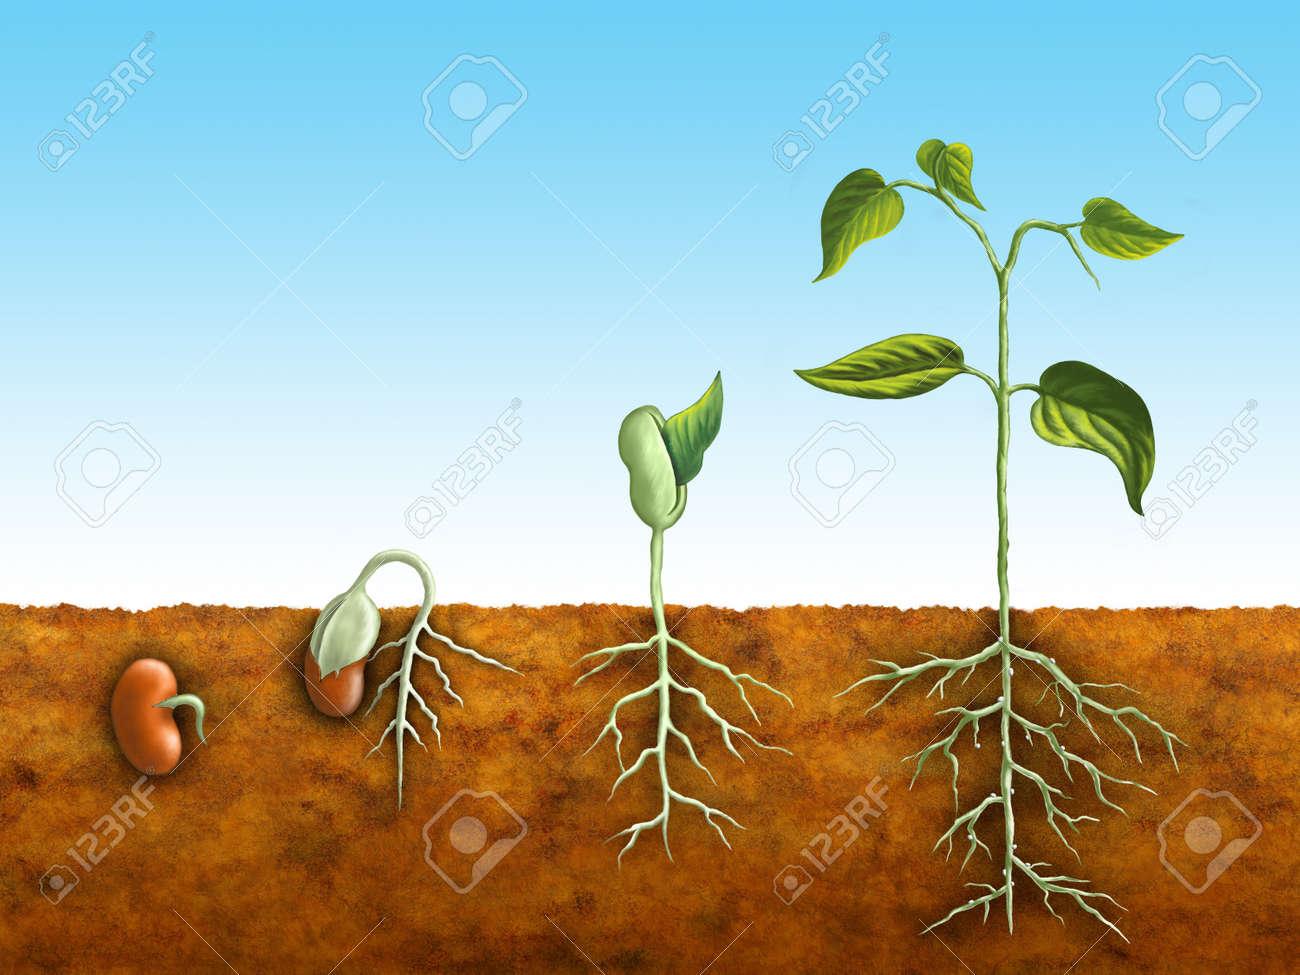 Green Bean Plant Illustration